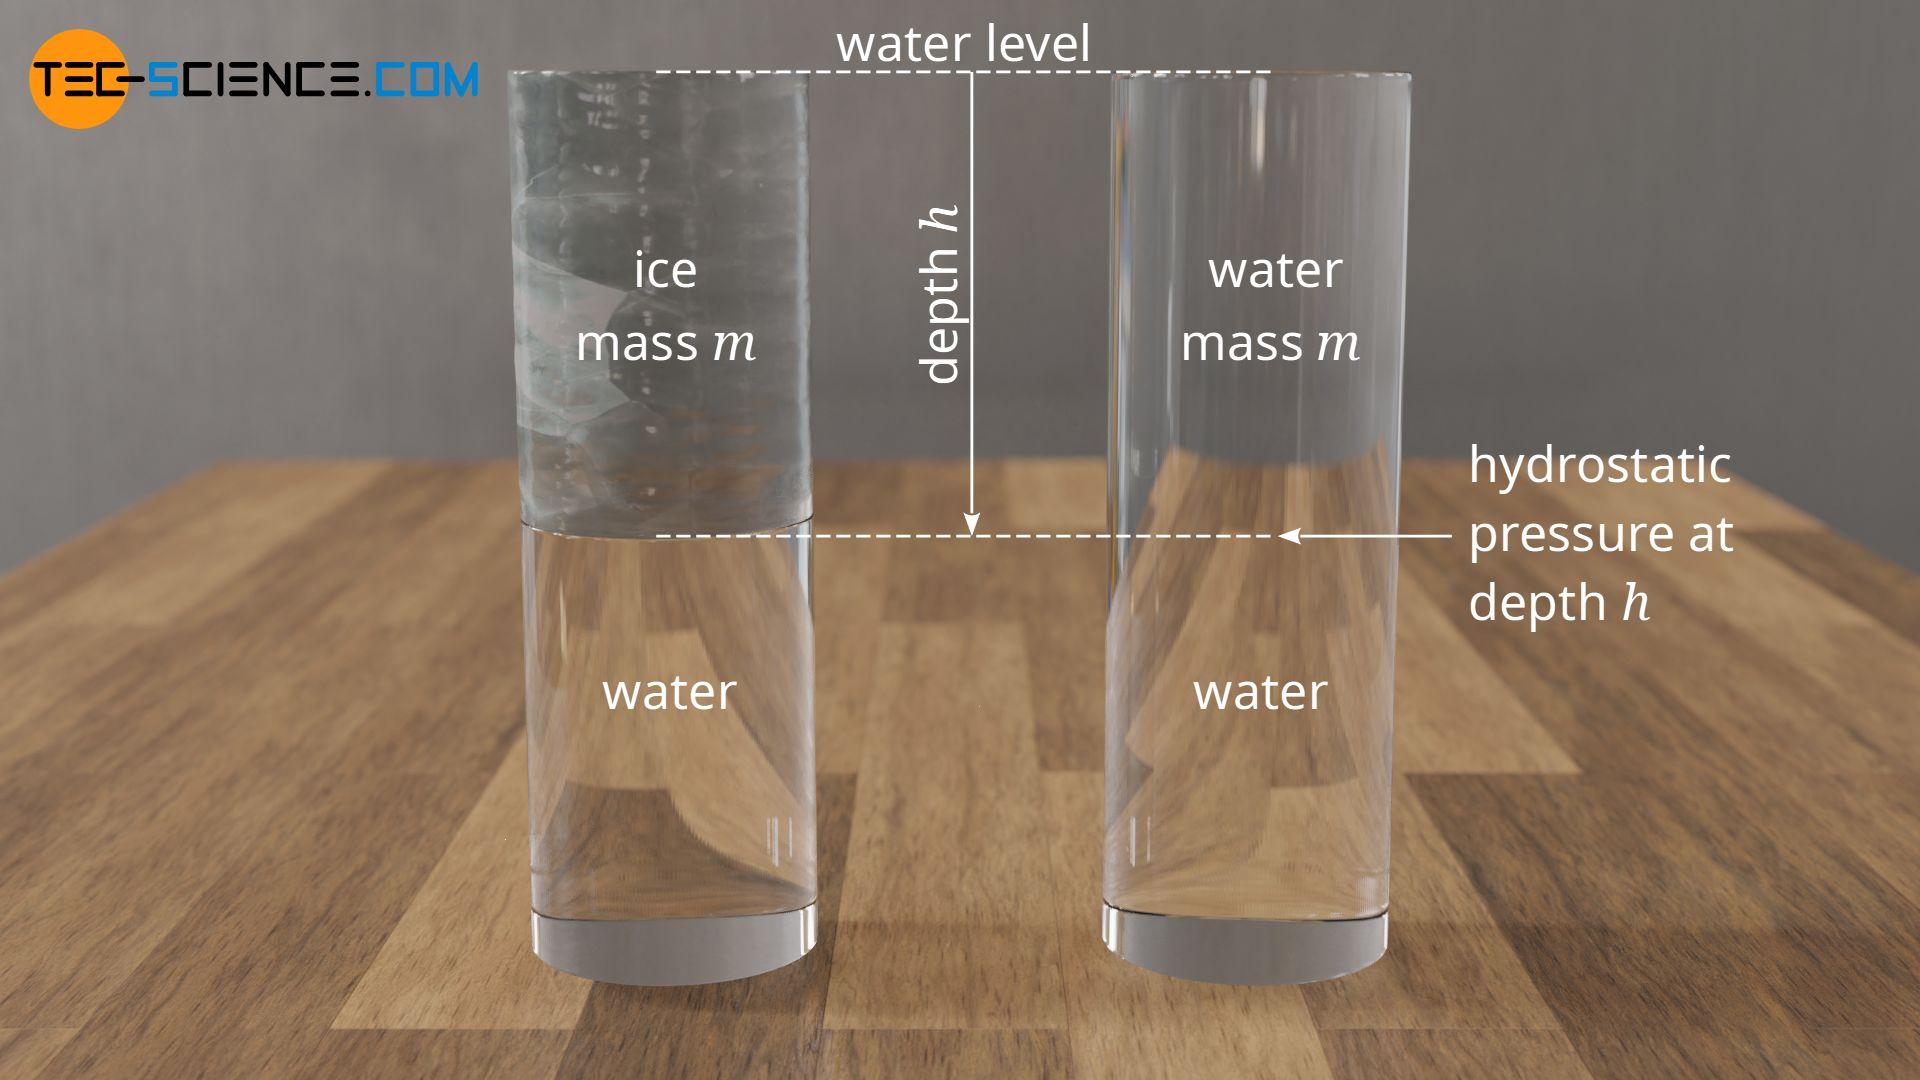 Hydrostatic pressure depending on depth